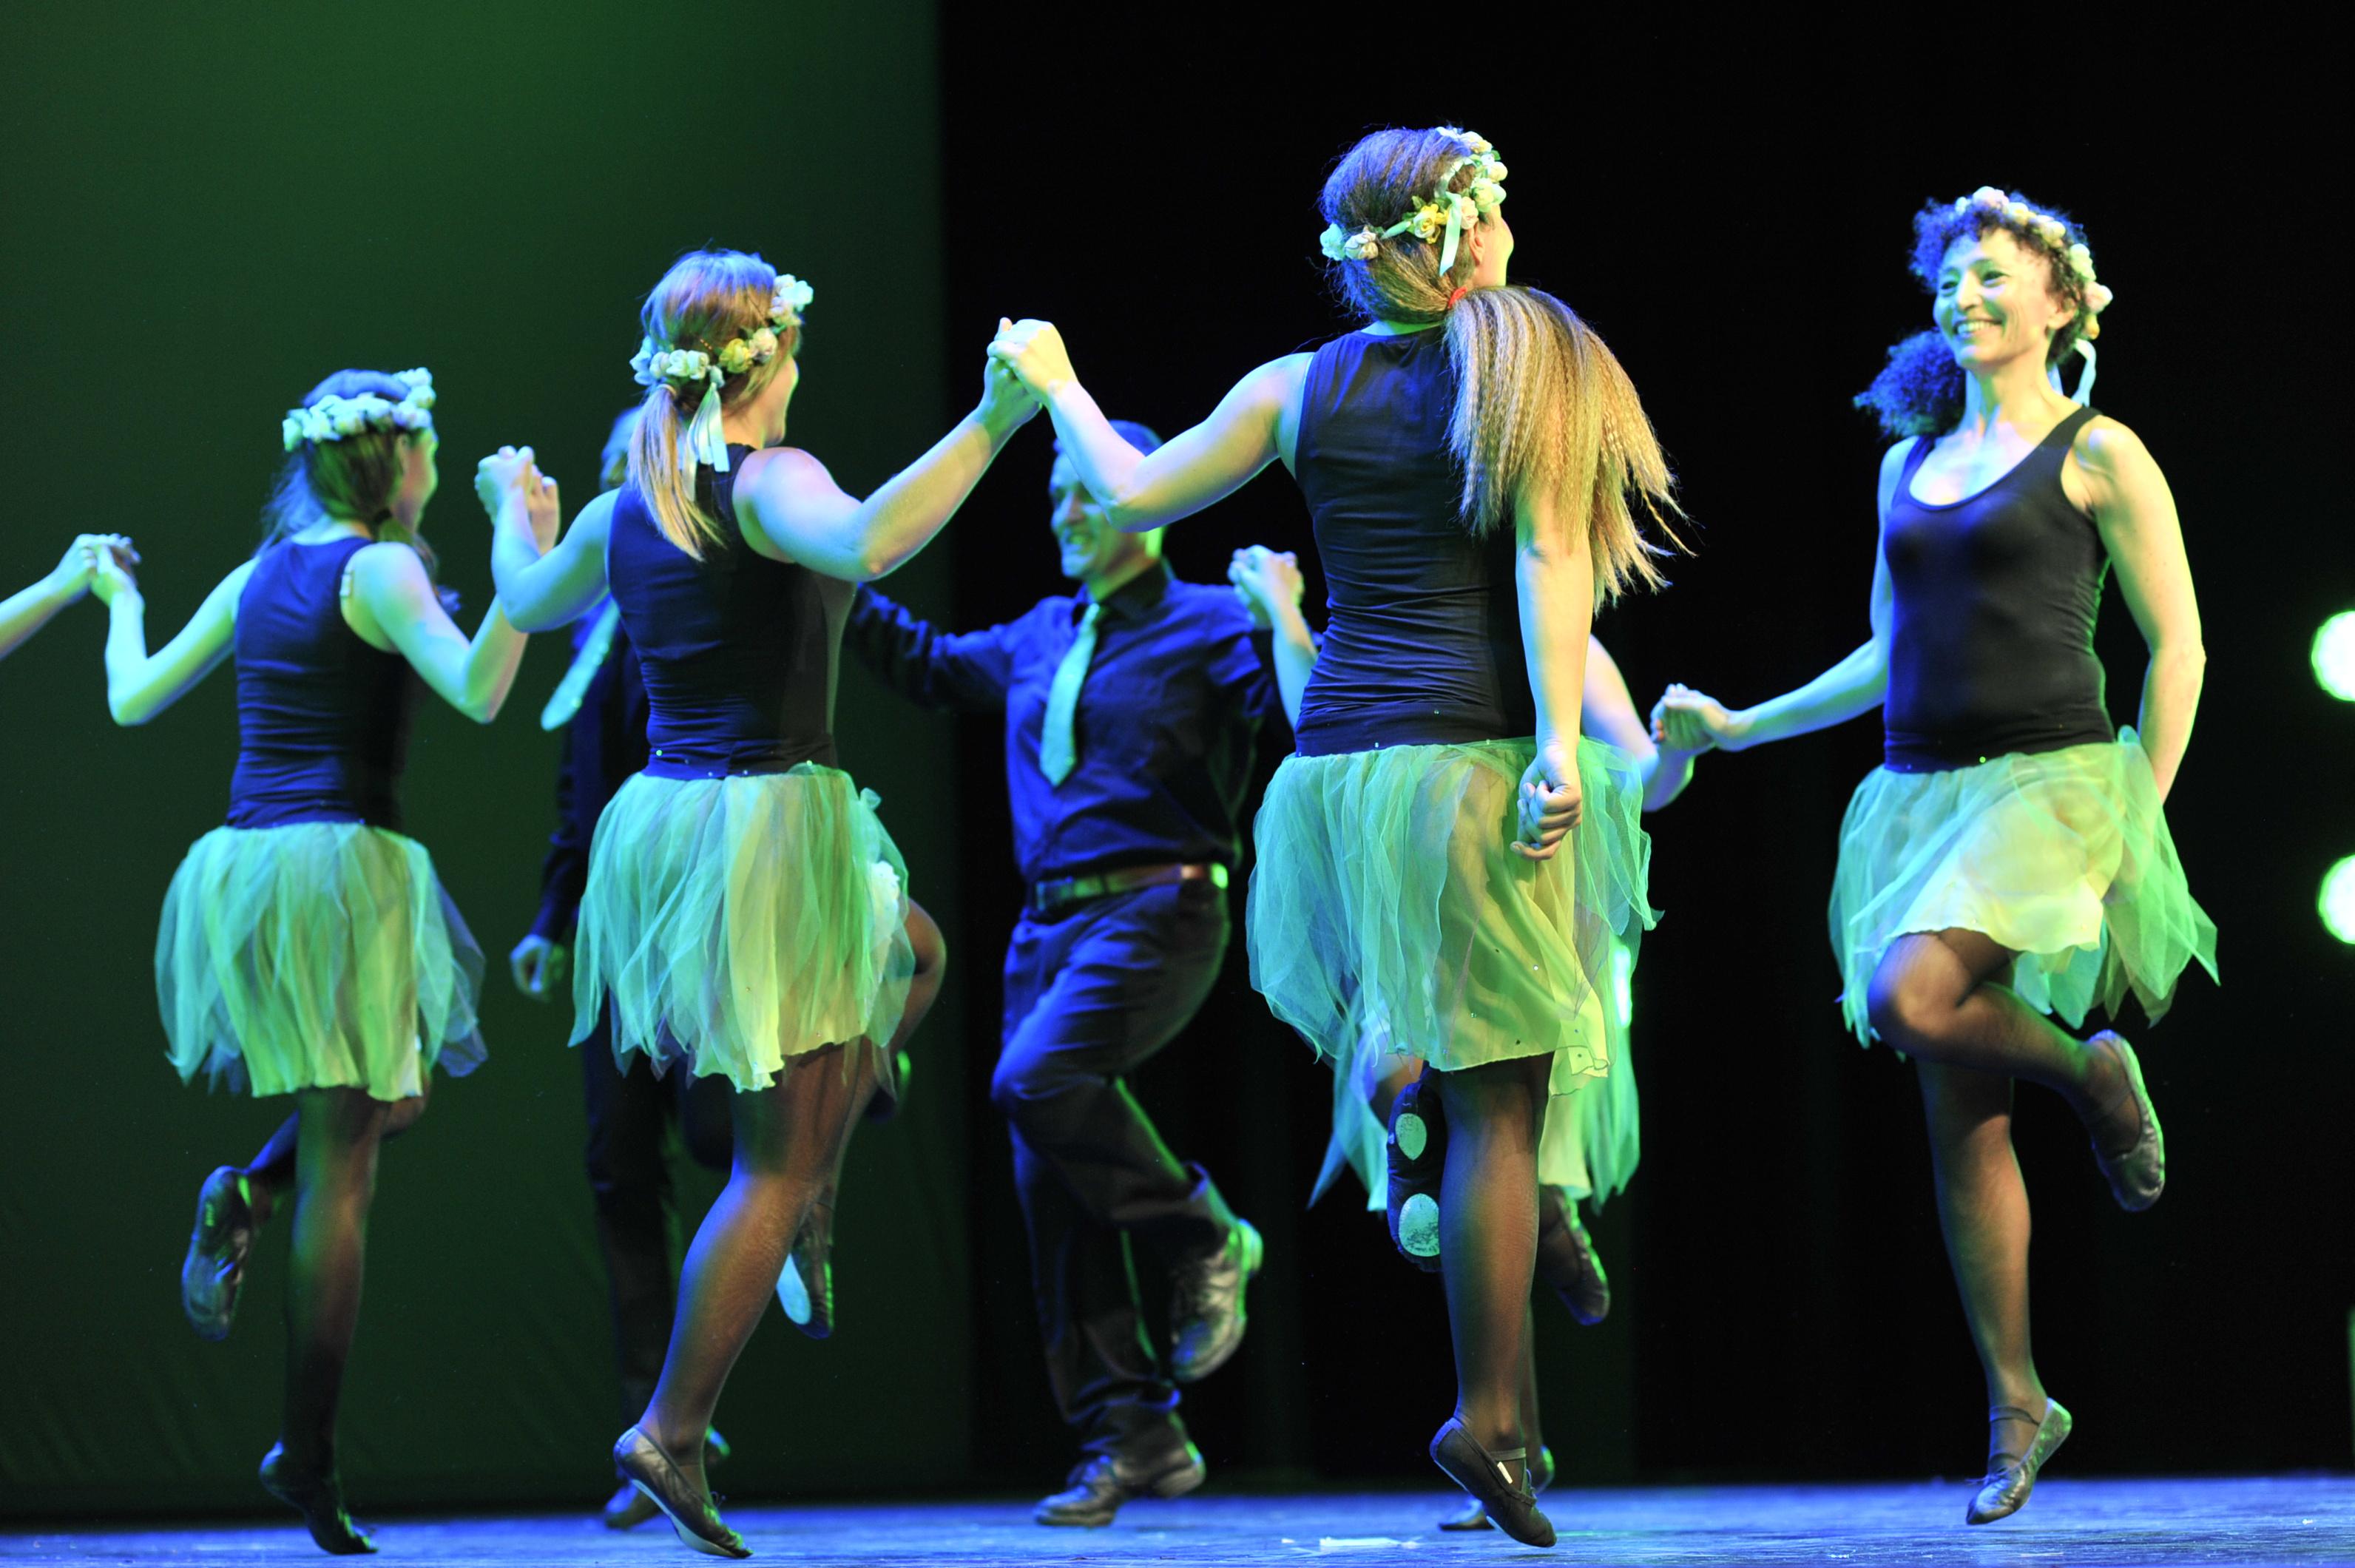 Danza Iralndese